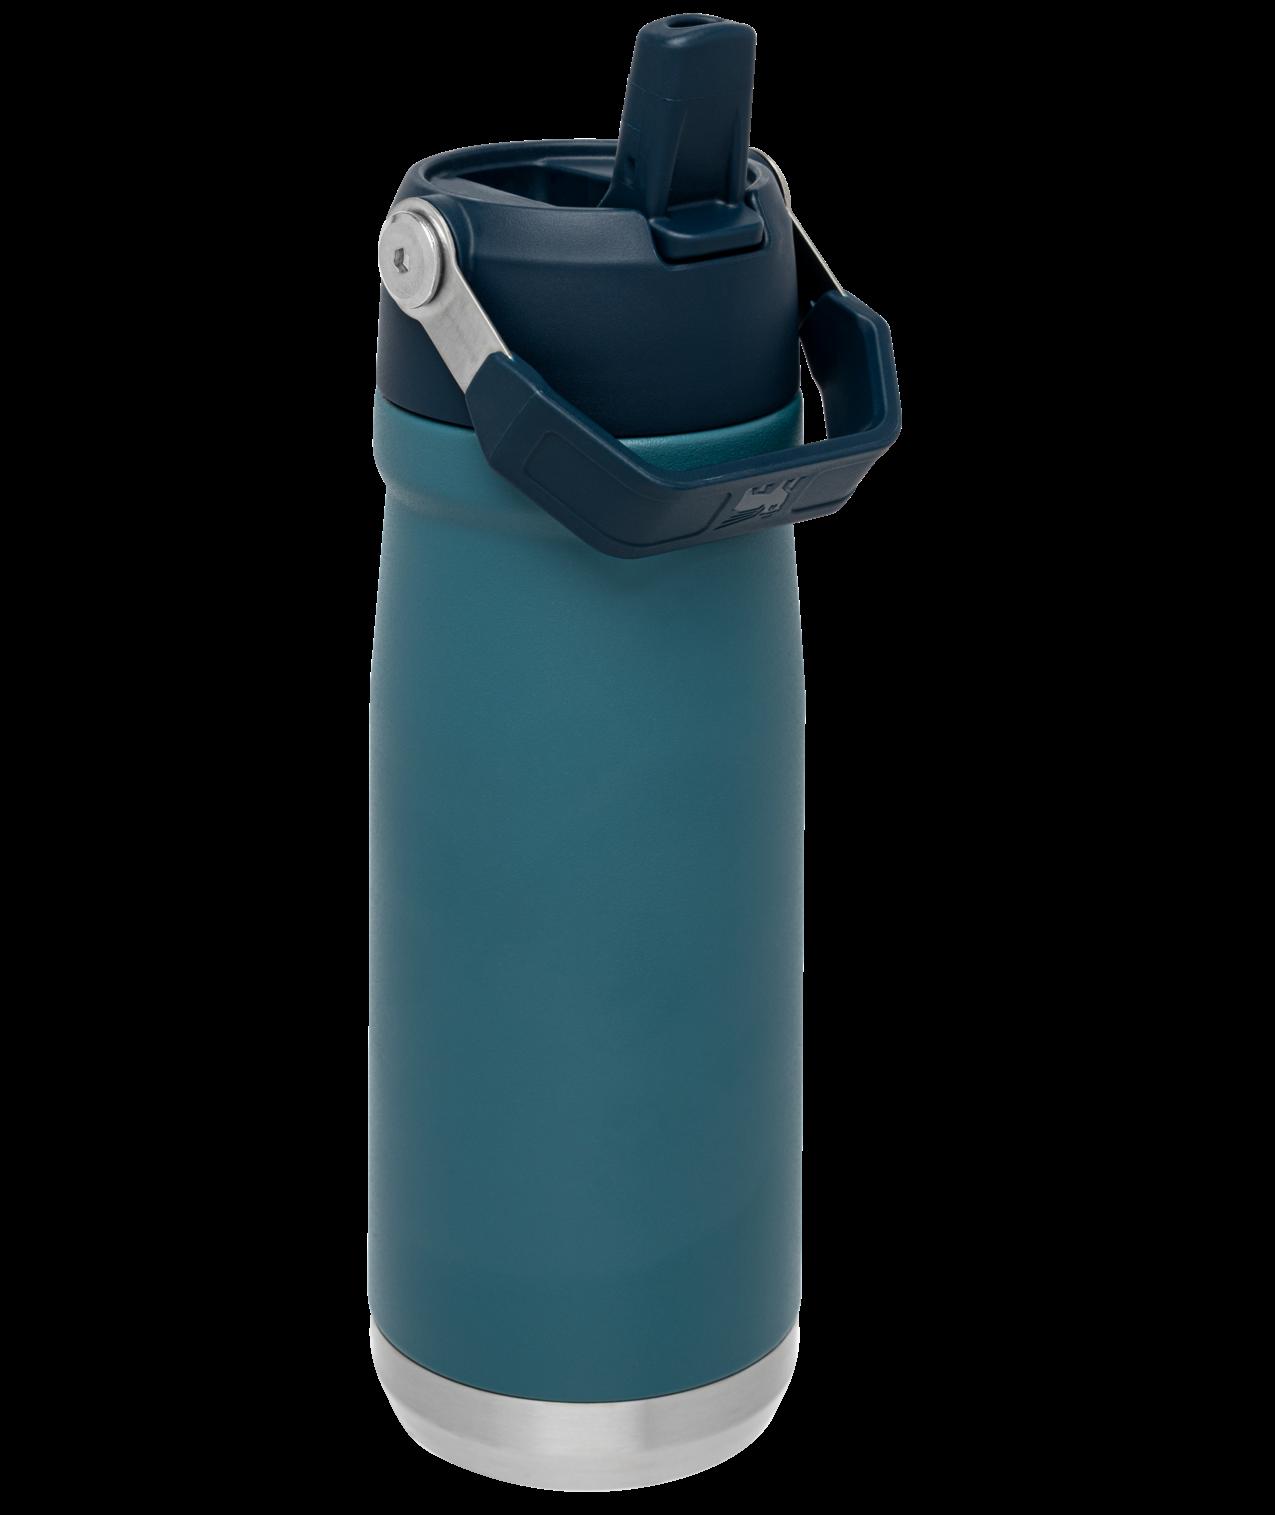 Bình giữ nhiệt Stanley Iceflow Flip Straw Water Bottle | 22 oz – Lagoon